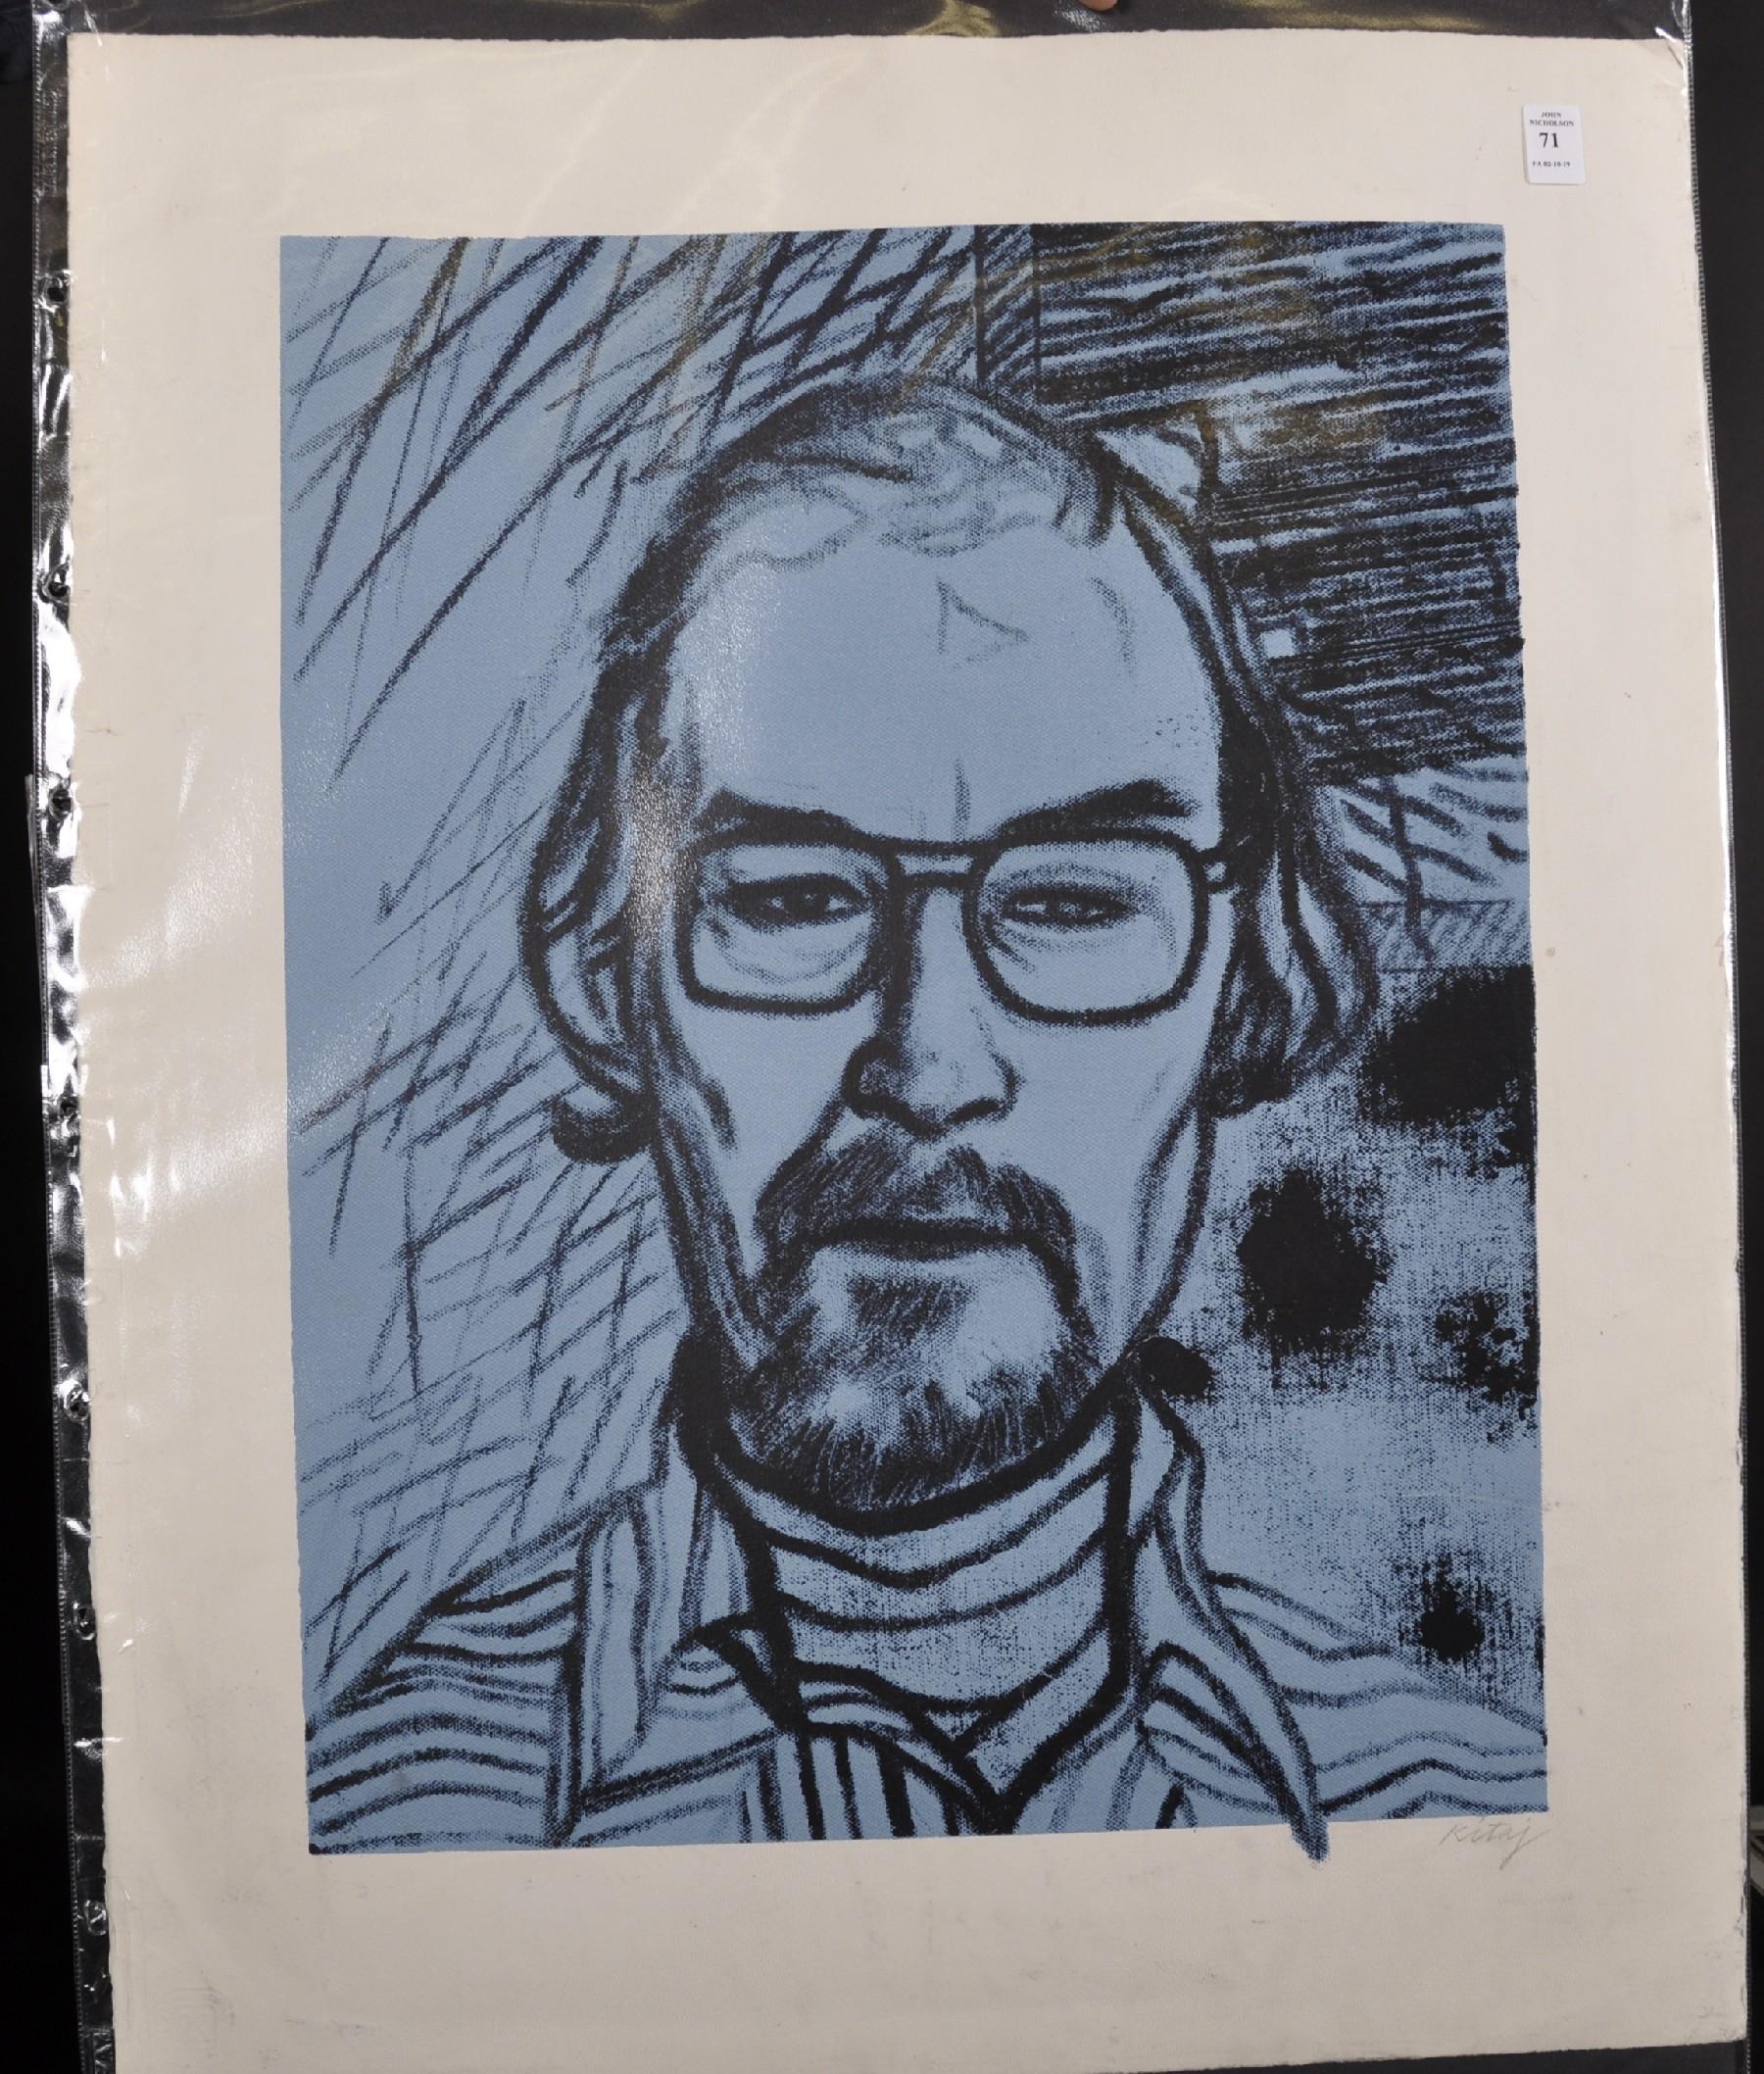 Ronald Brooks Kitaj (1932-2007) American. Portrait of Chris Prater (1890), Screenprint in Colours, - Image 2 of 3